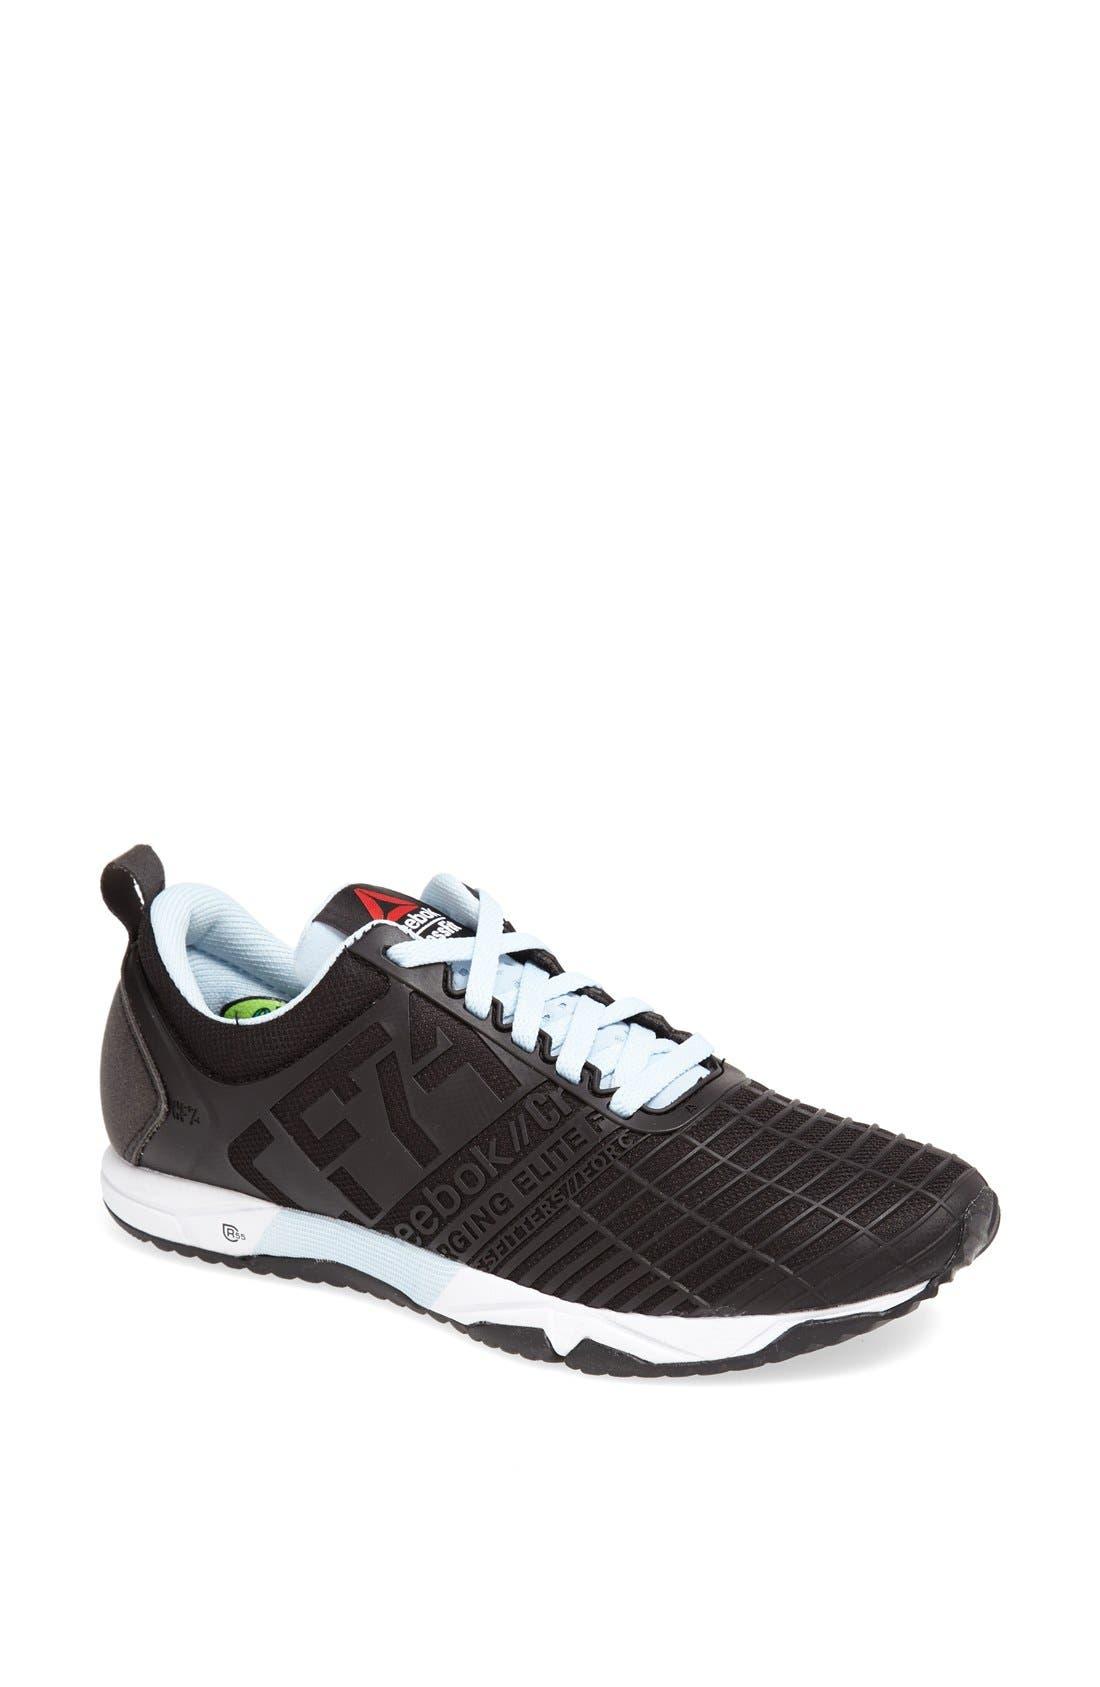 Main Image - Reebok 'Crossfit Sprint' Training Shoe (Women)